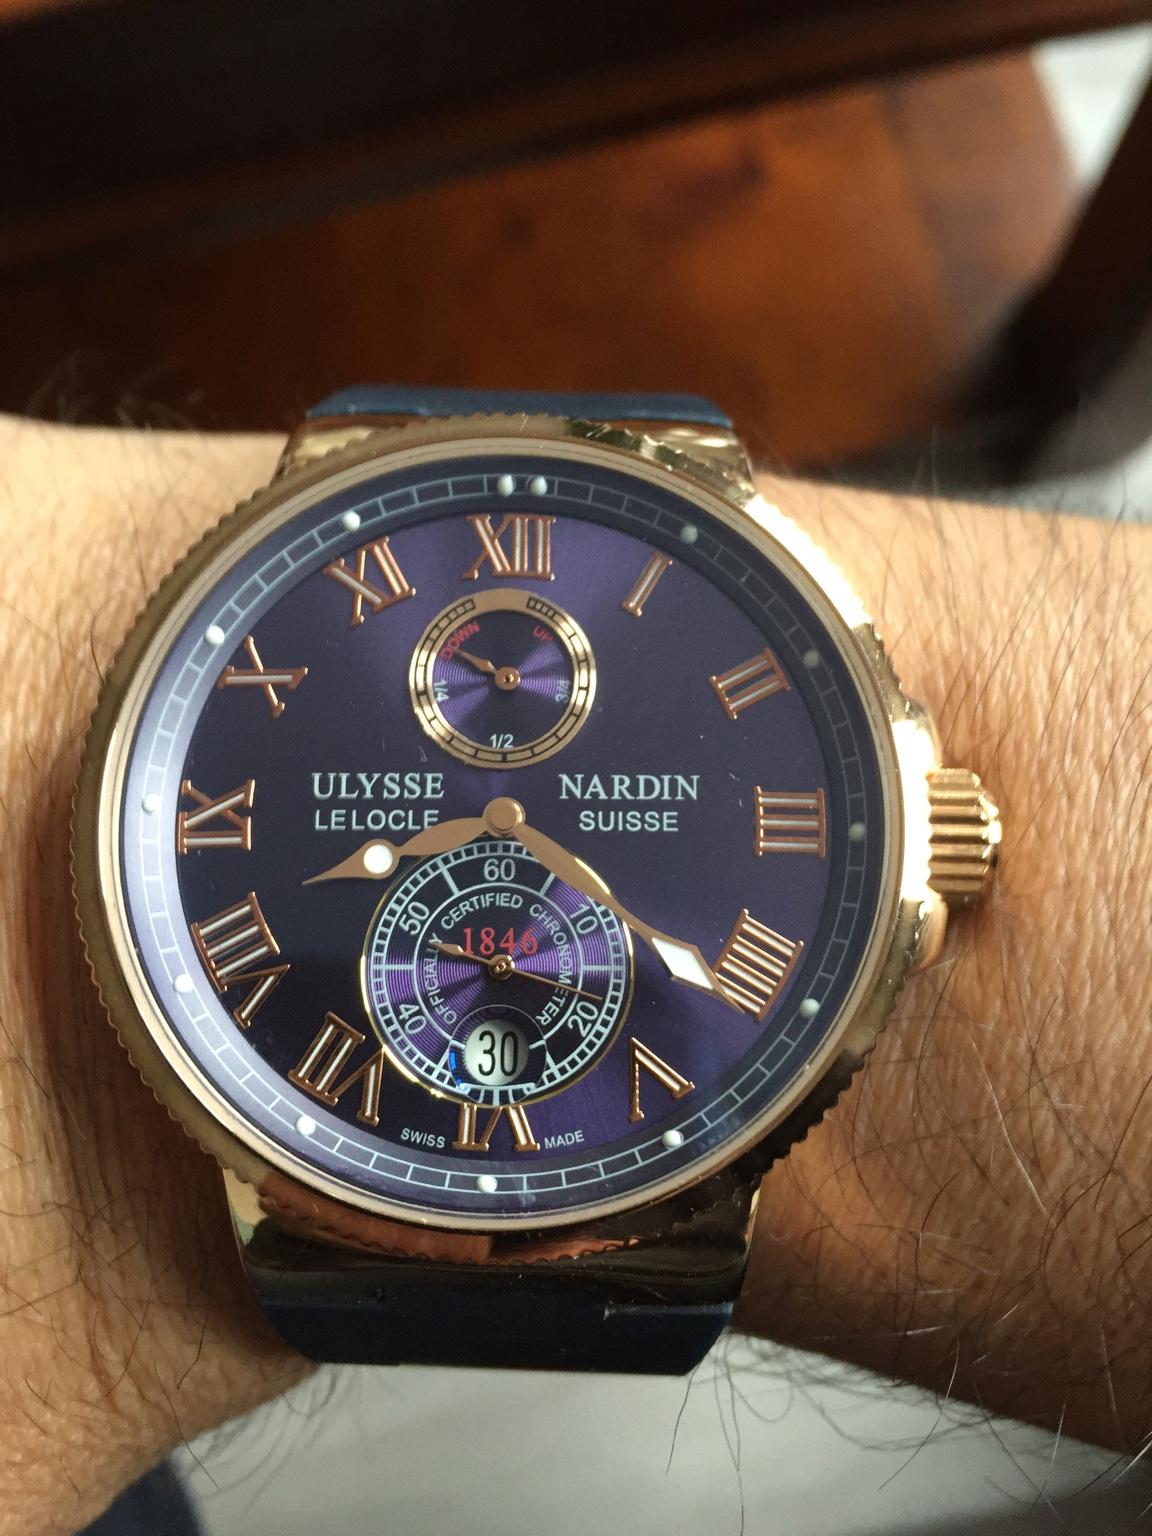 Копия часов: ulysse nardin (улисс нардэн) коллекция: maxi marine chronometer модель: ulysse nardin le locle suisse.